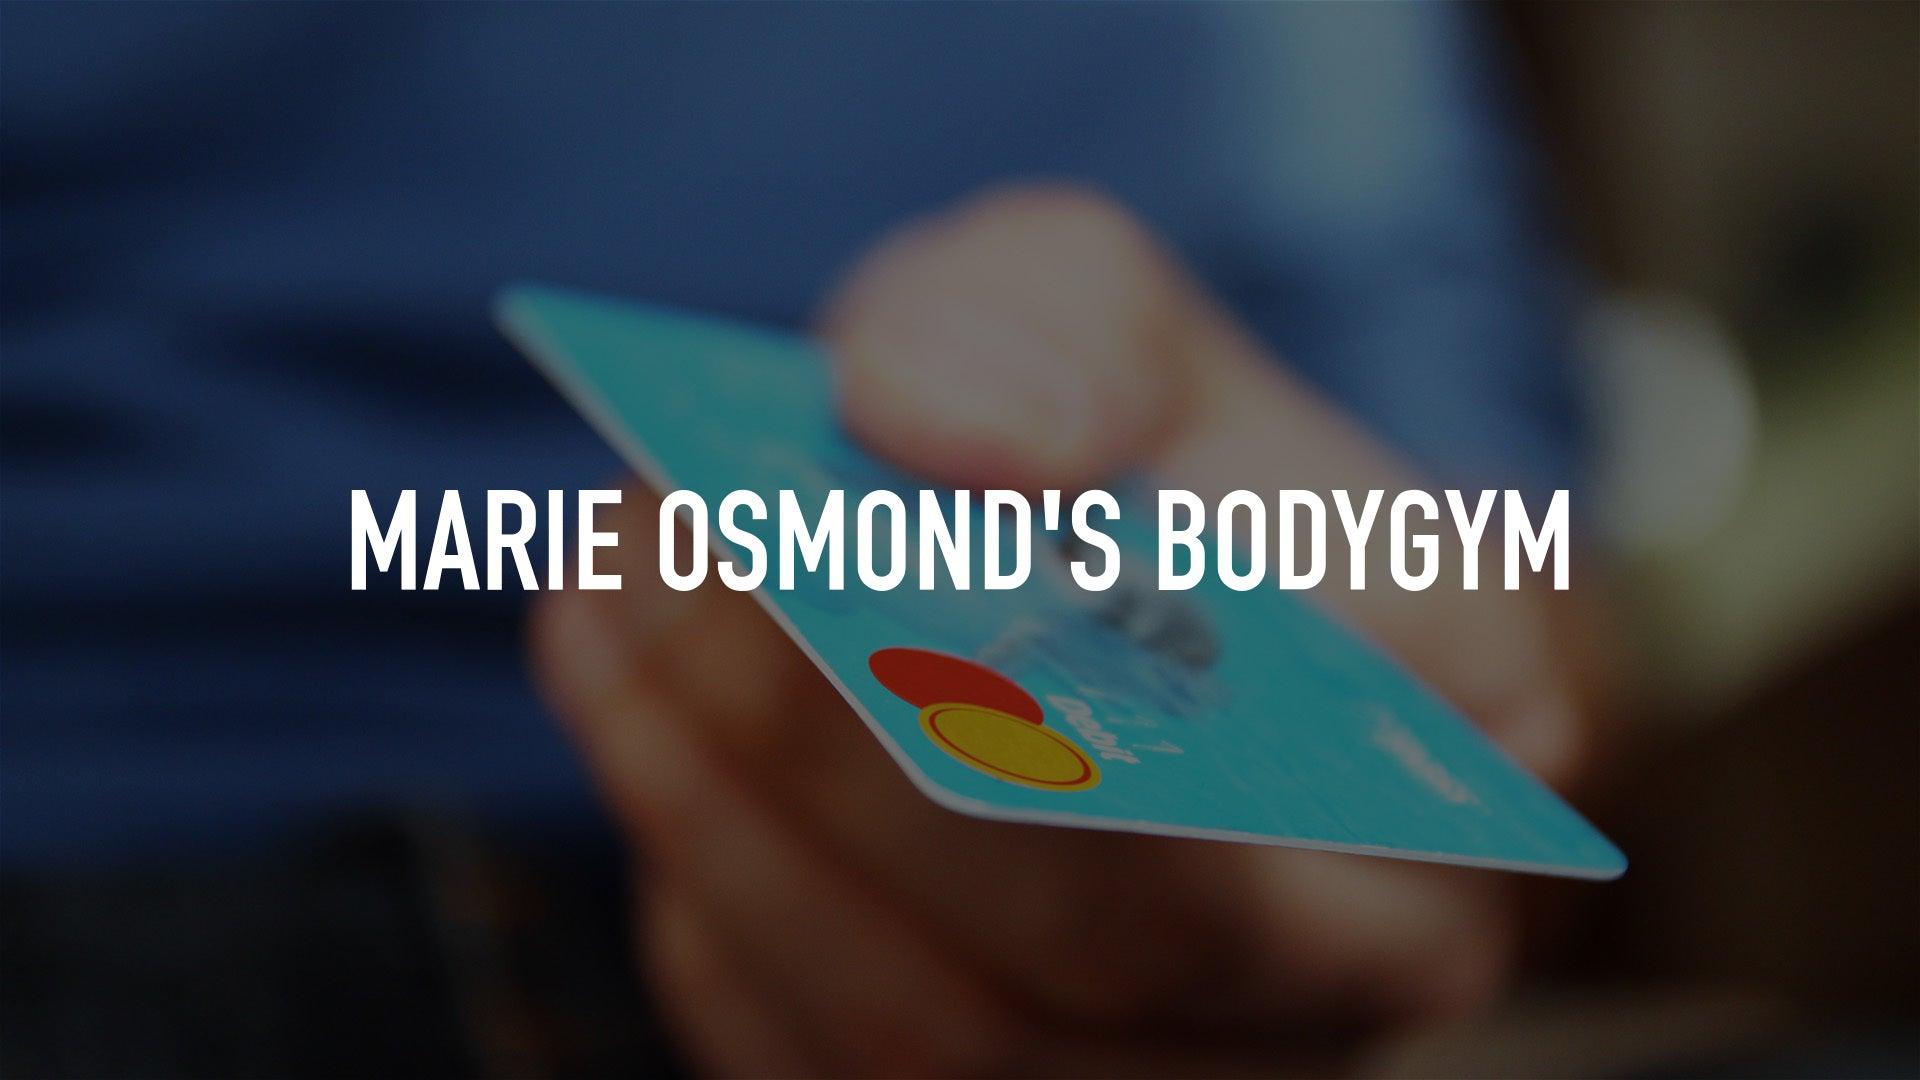 Marie Osmond's BodyGym